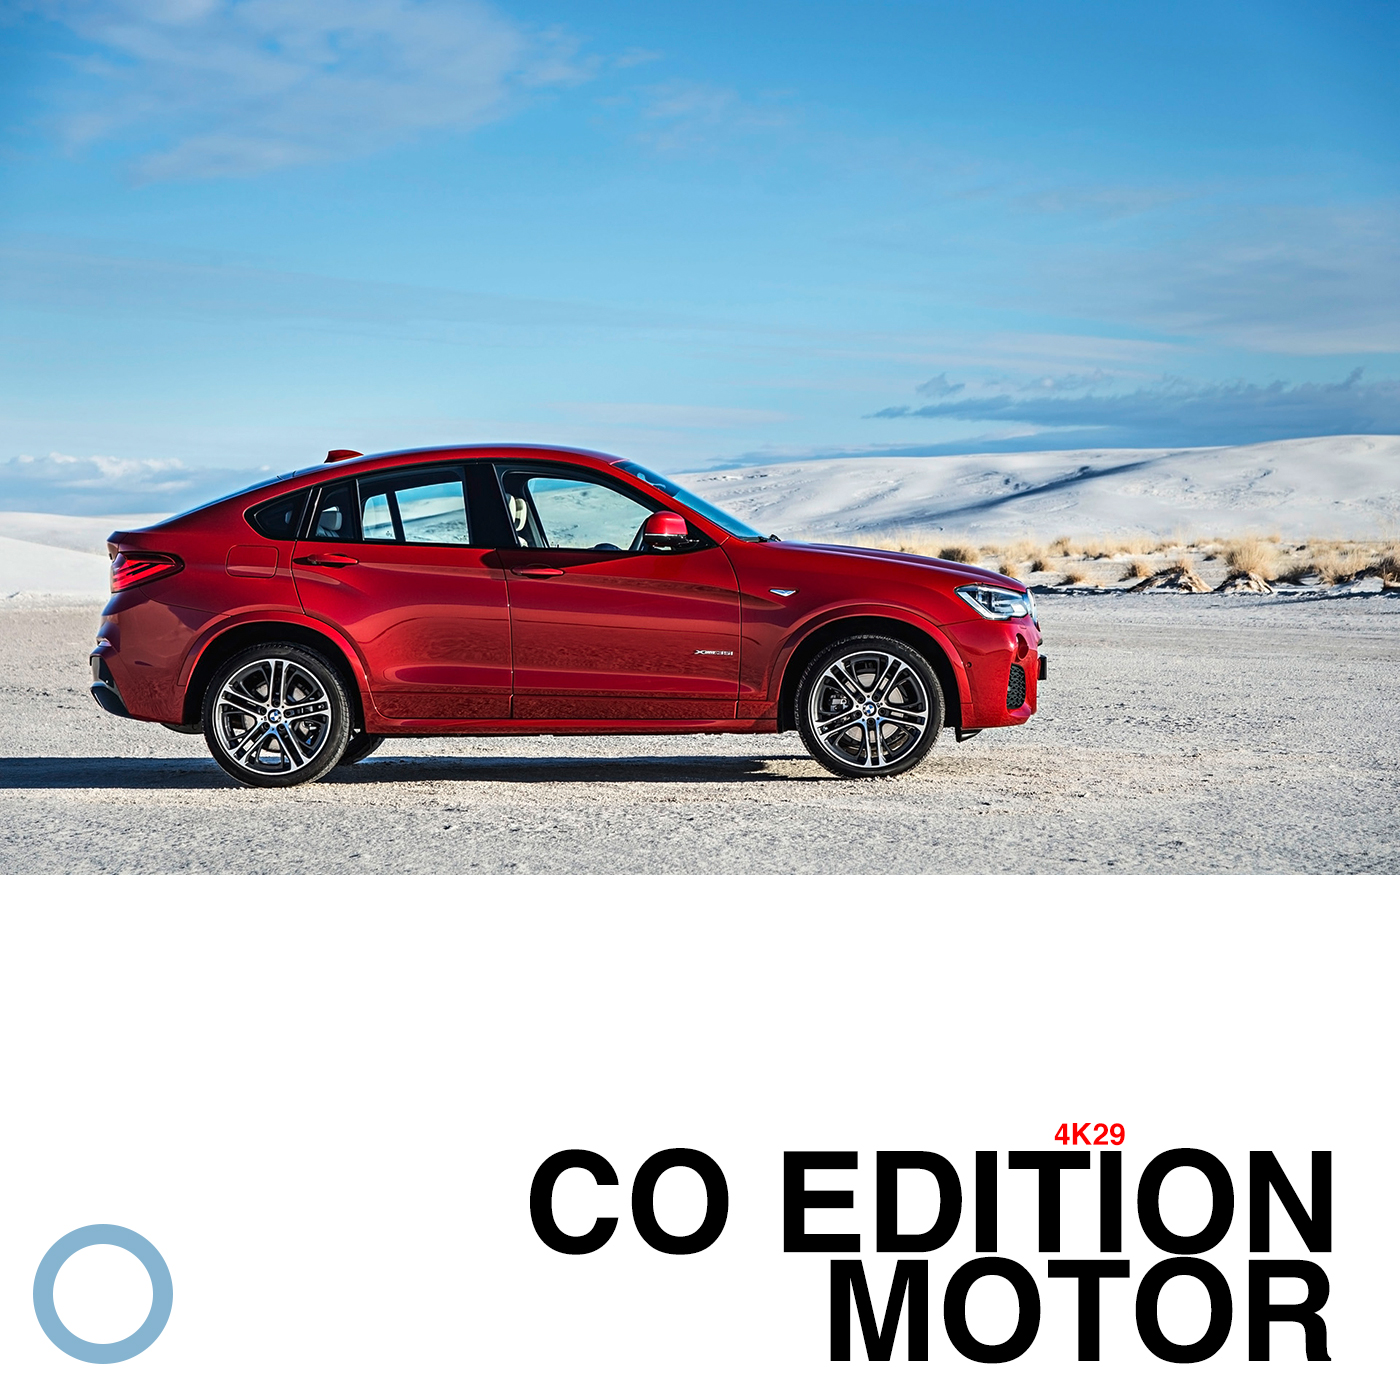 CO EDITION MOTOR 4K29